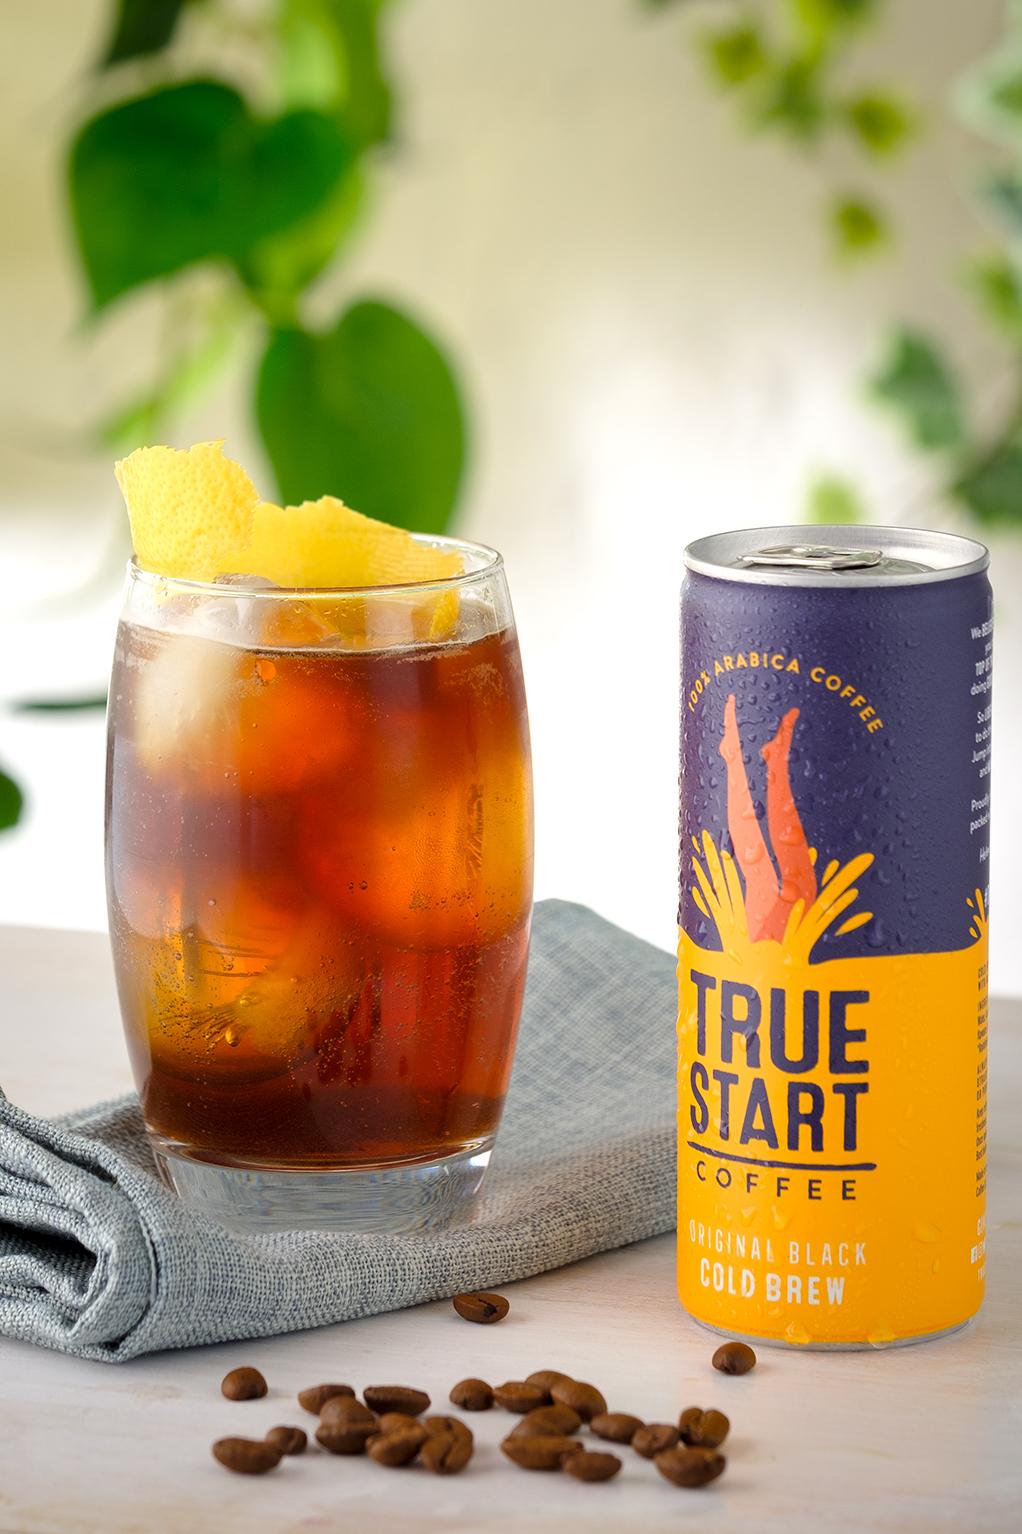 TrueStart Cold Brew - Original Black - 250ml